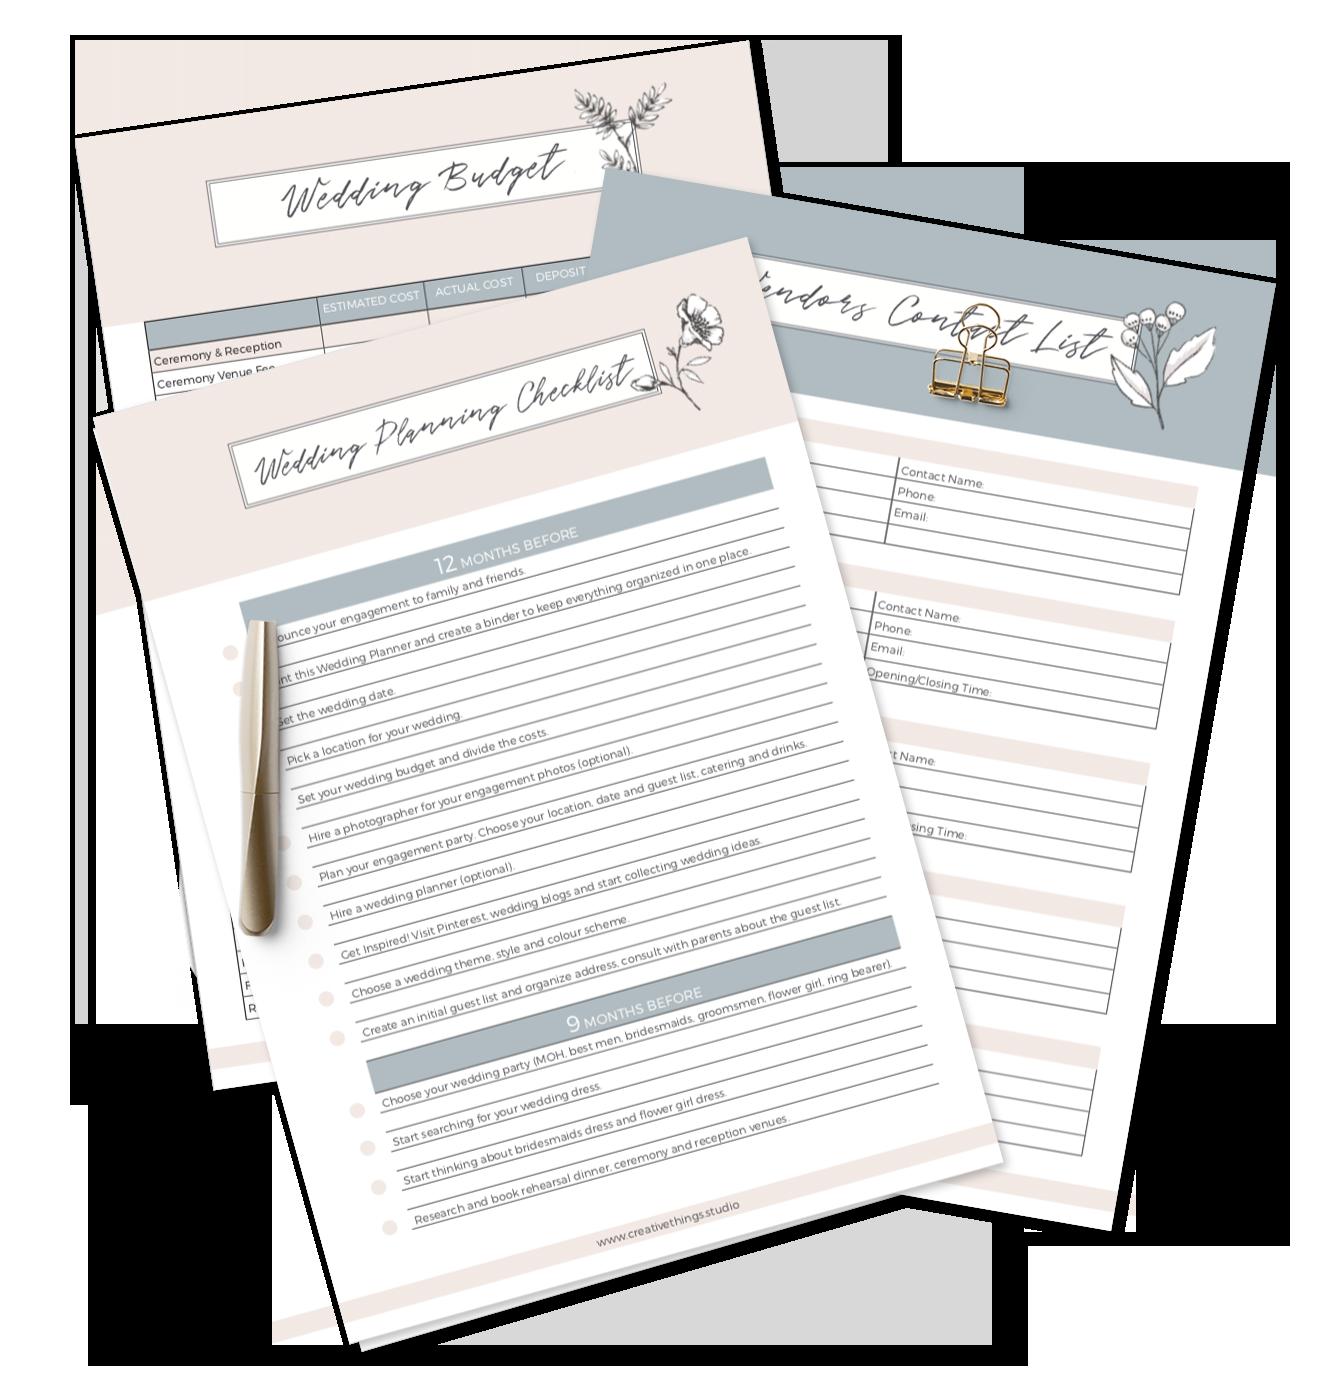 Free Printable Wedding Planner By Creativethings Studio Free Wedding Planner Printables Wedding Planner Printables Free Wedding Printables